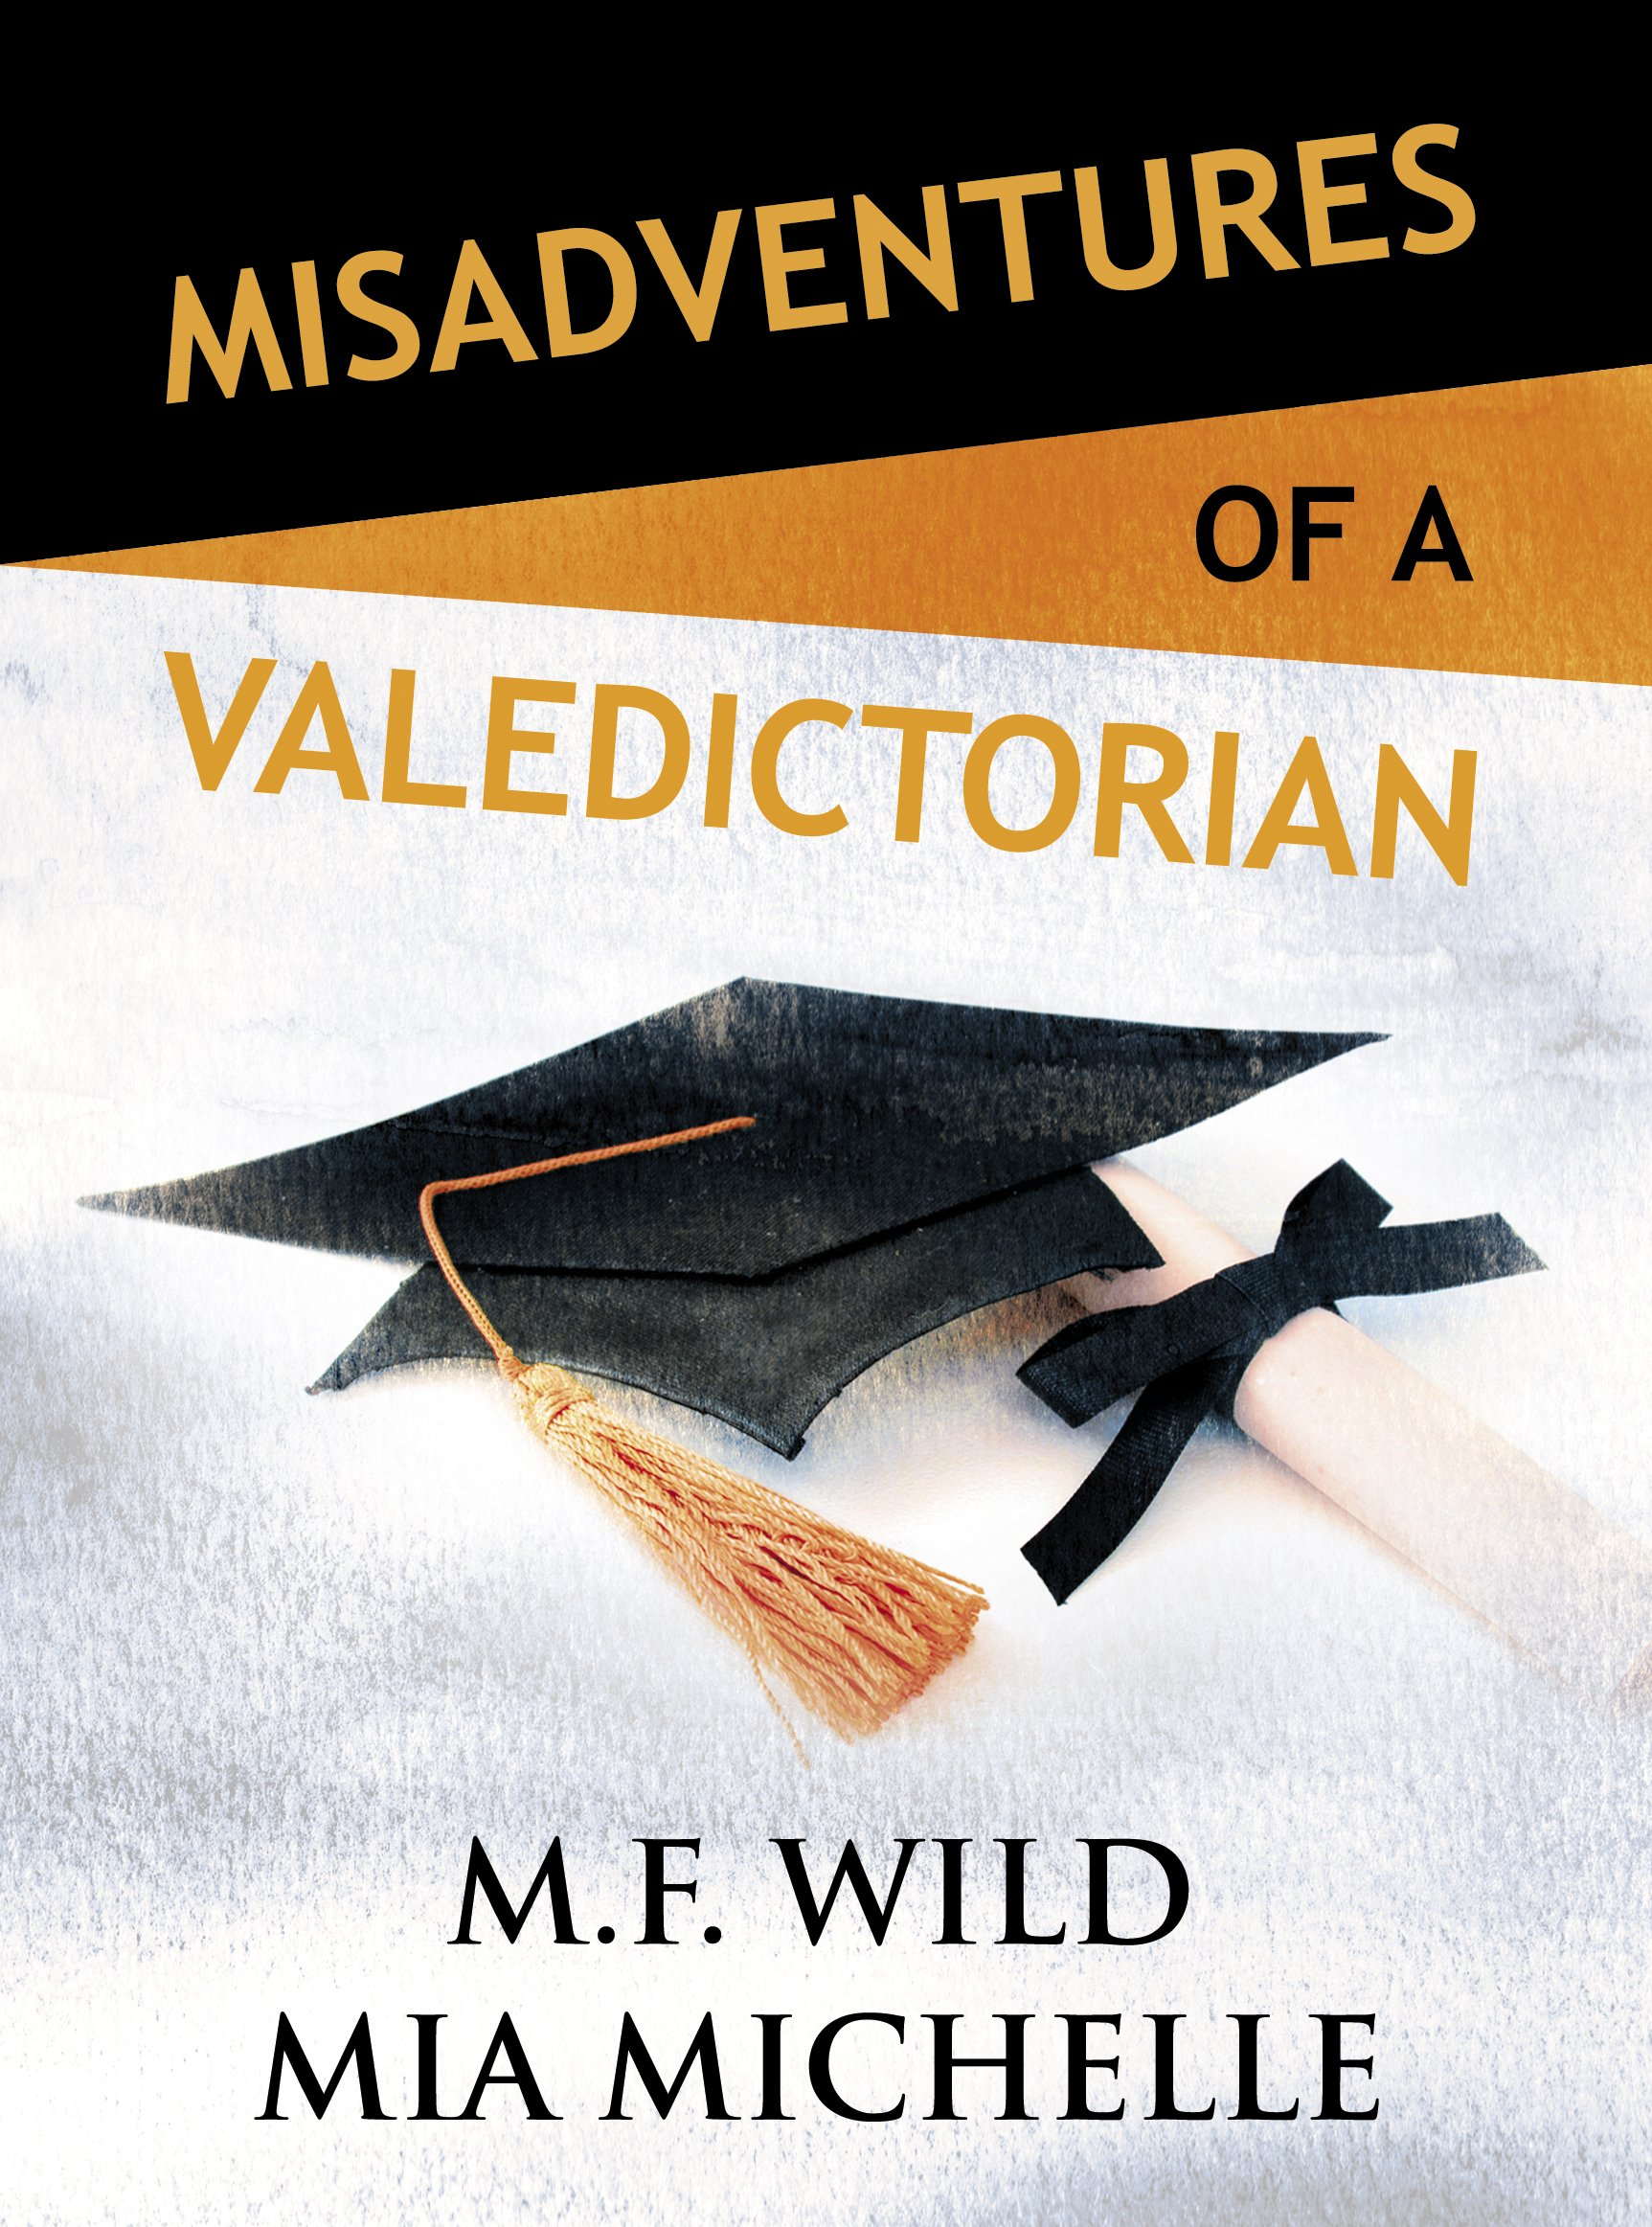 Misadventures of a Valedictorian (Misadventures Book 7)